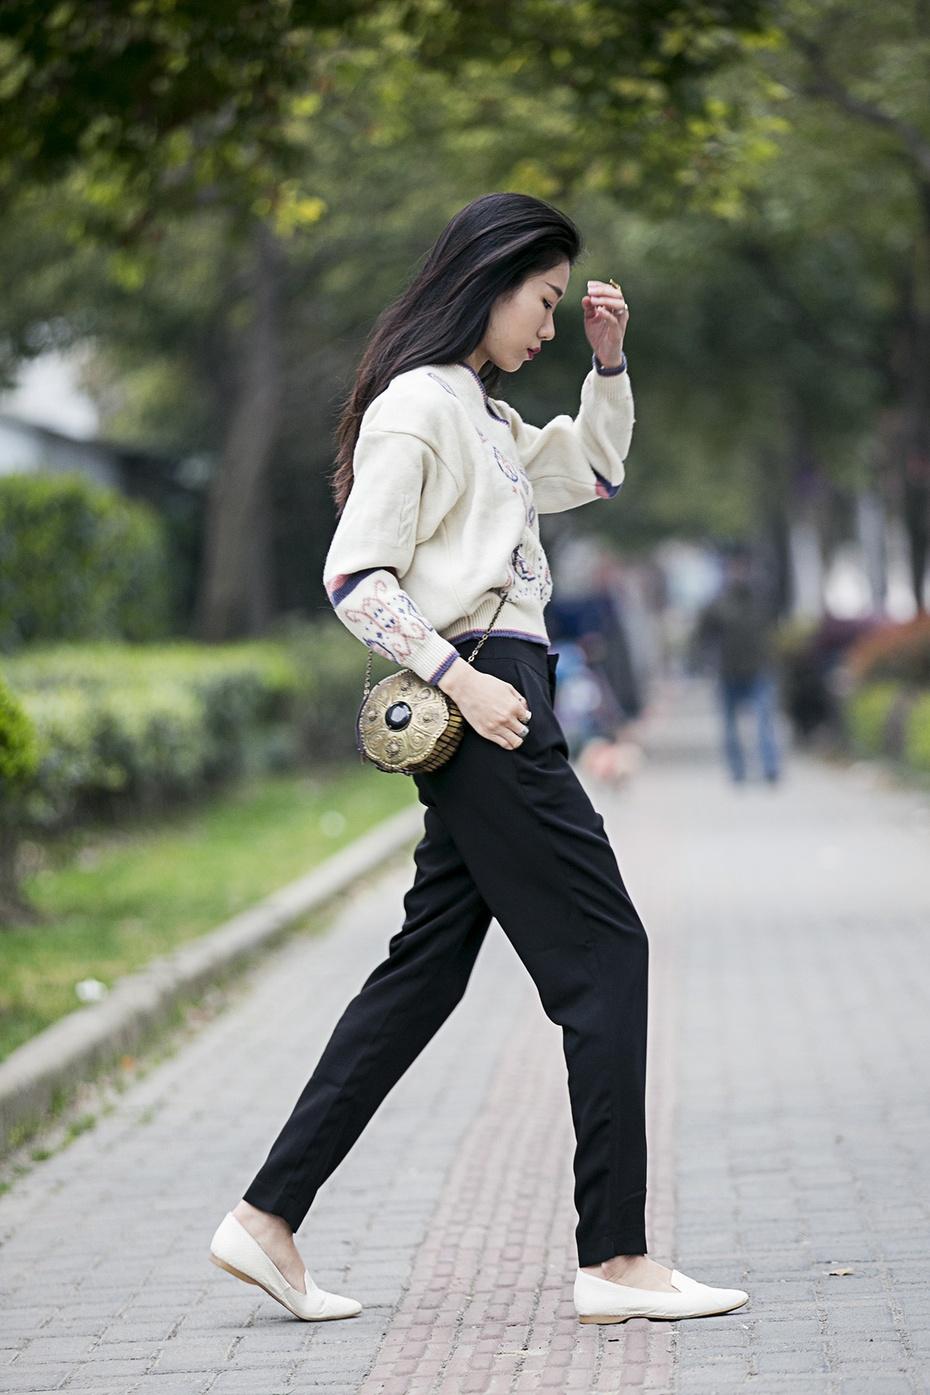 [Ava搭配周记]经久不衰的黑白单品 - AvaFoo - Avas Fashion Blog